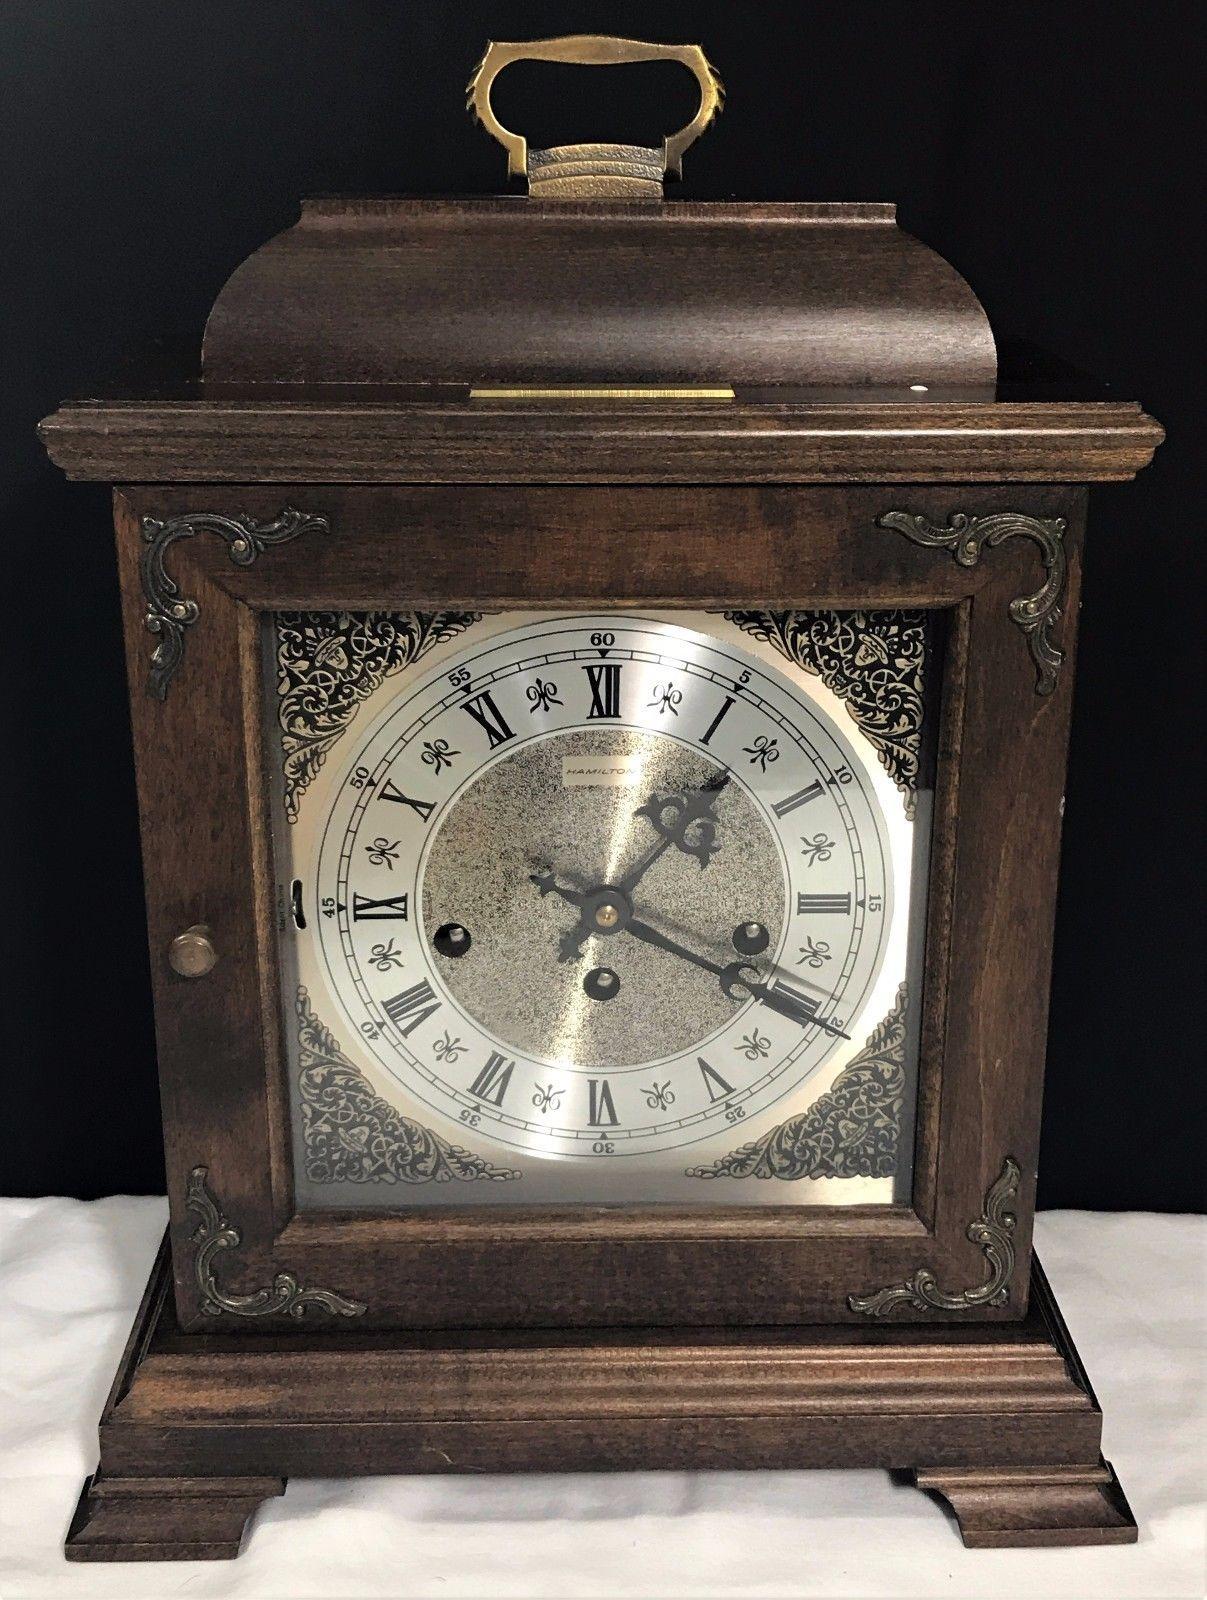 Hamilton Wheatland Westminster Chime Key Wound Mantel Clock